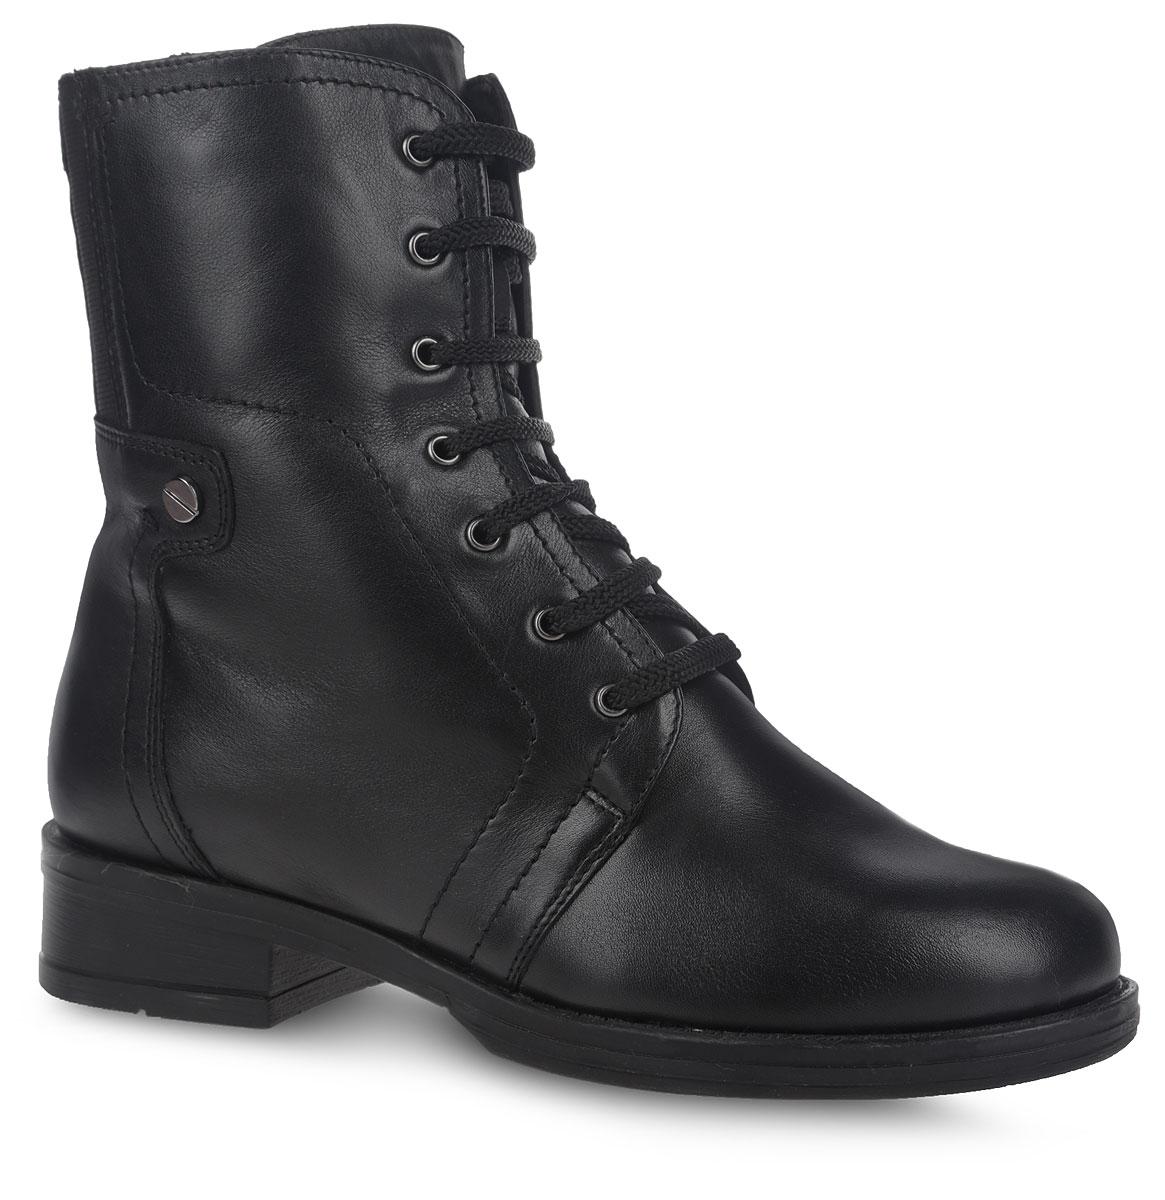 Ботинки женские. 9SO_713-115_BLACK9SO_713-115_BLACK